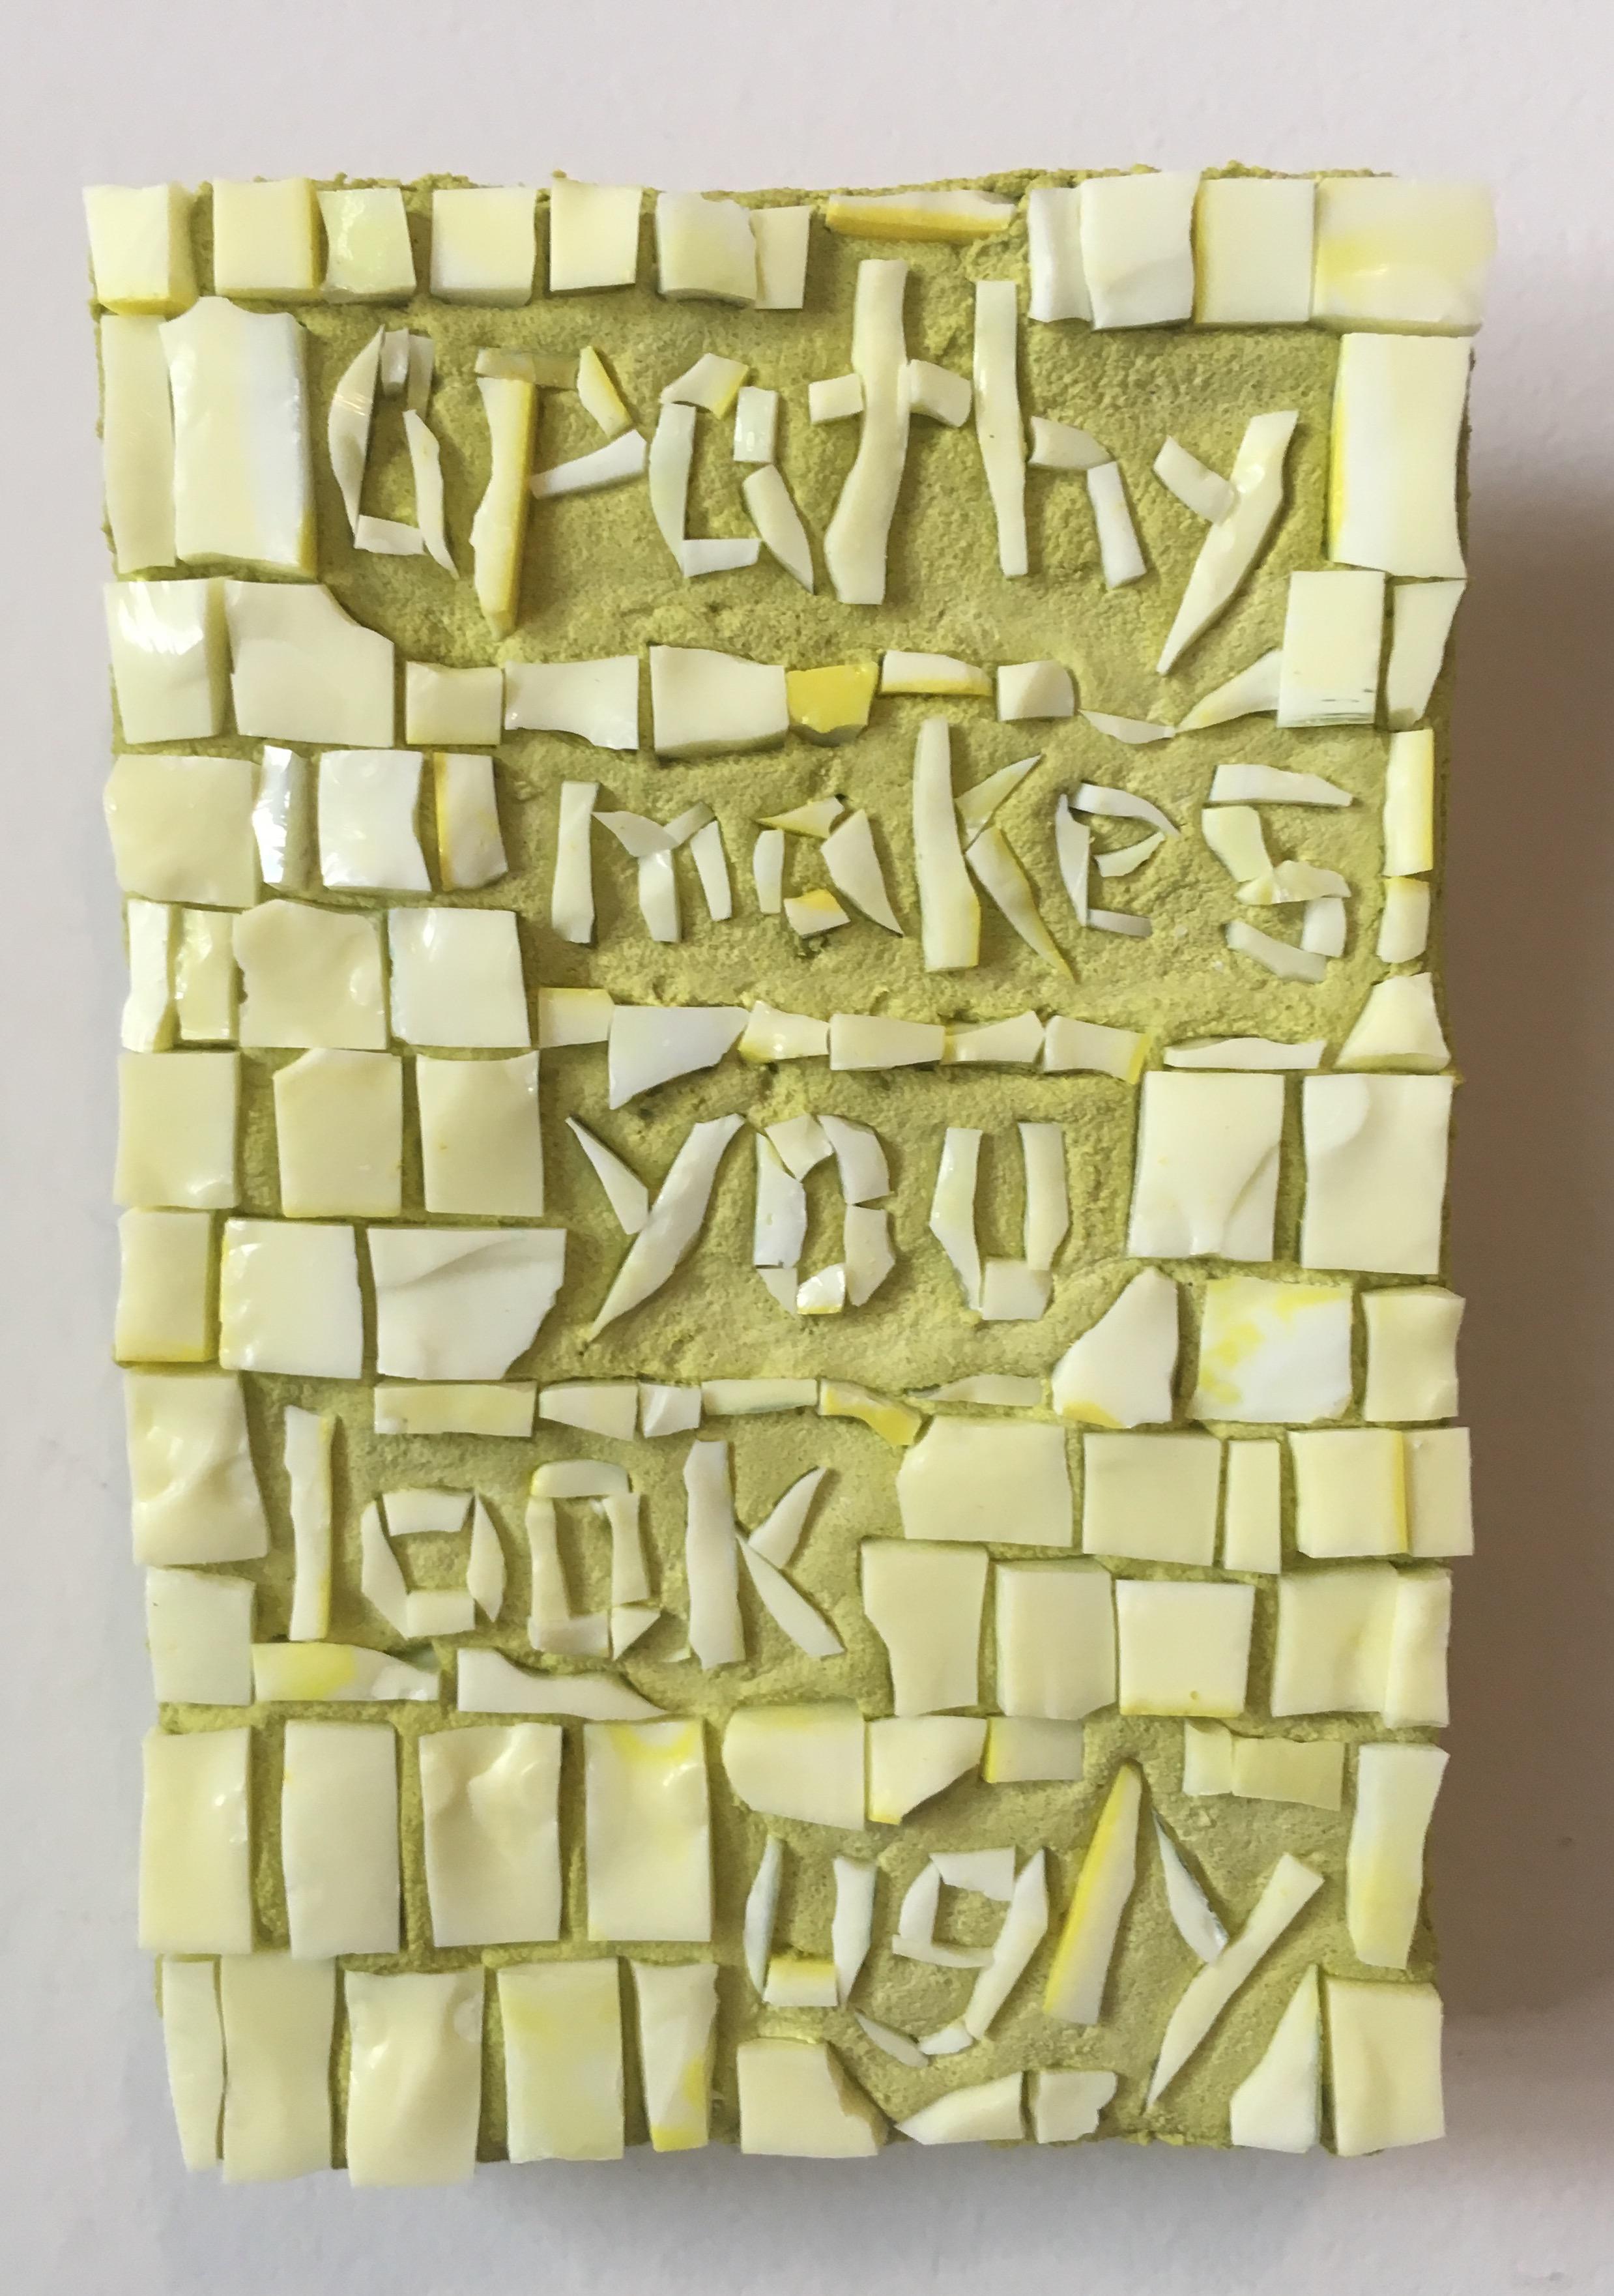 Mosaic Poem 2 (apathy)